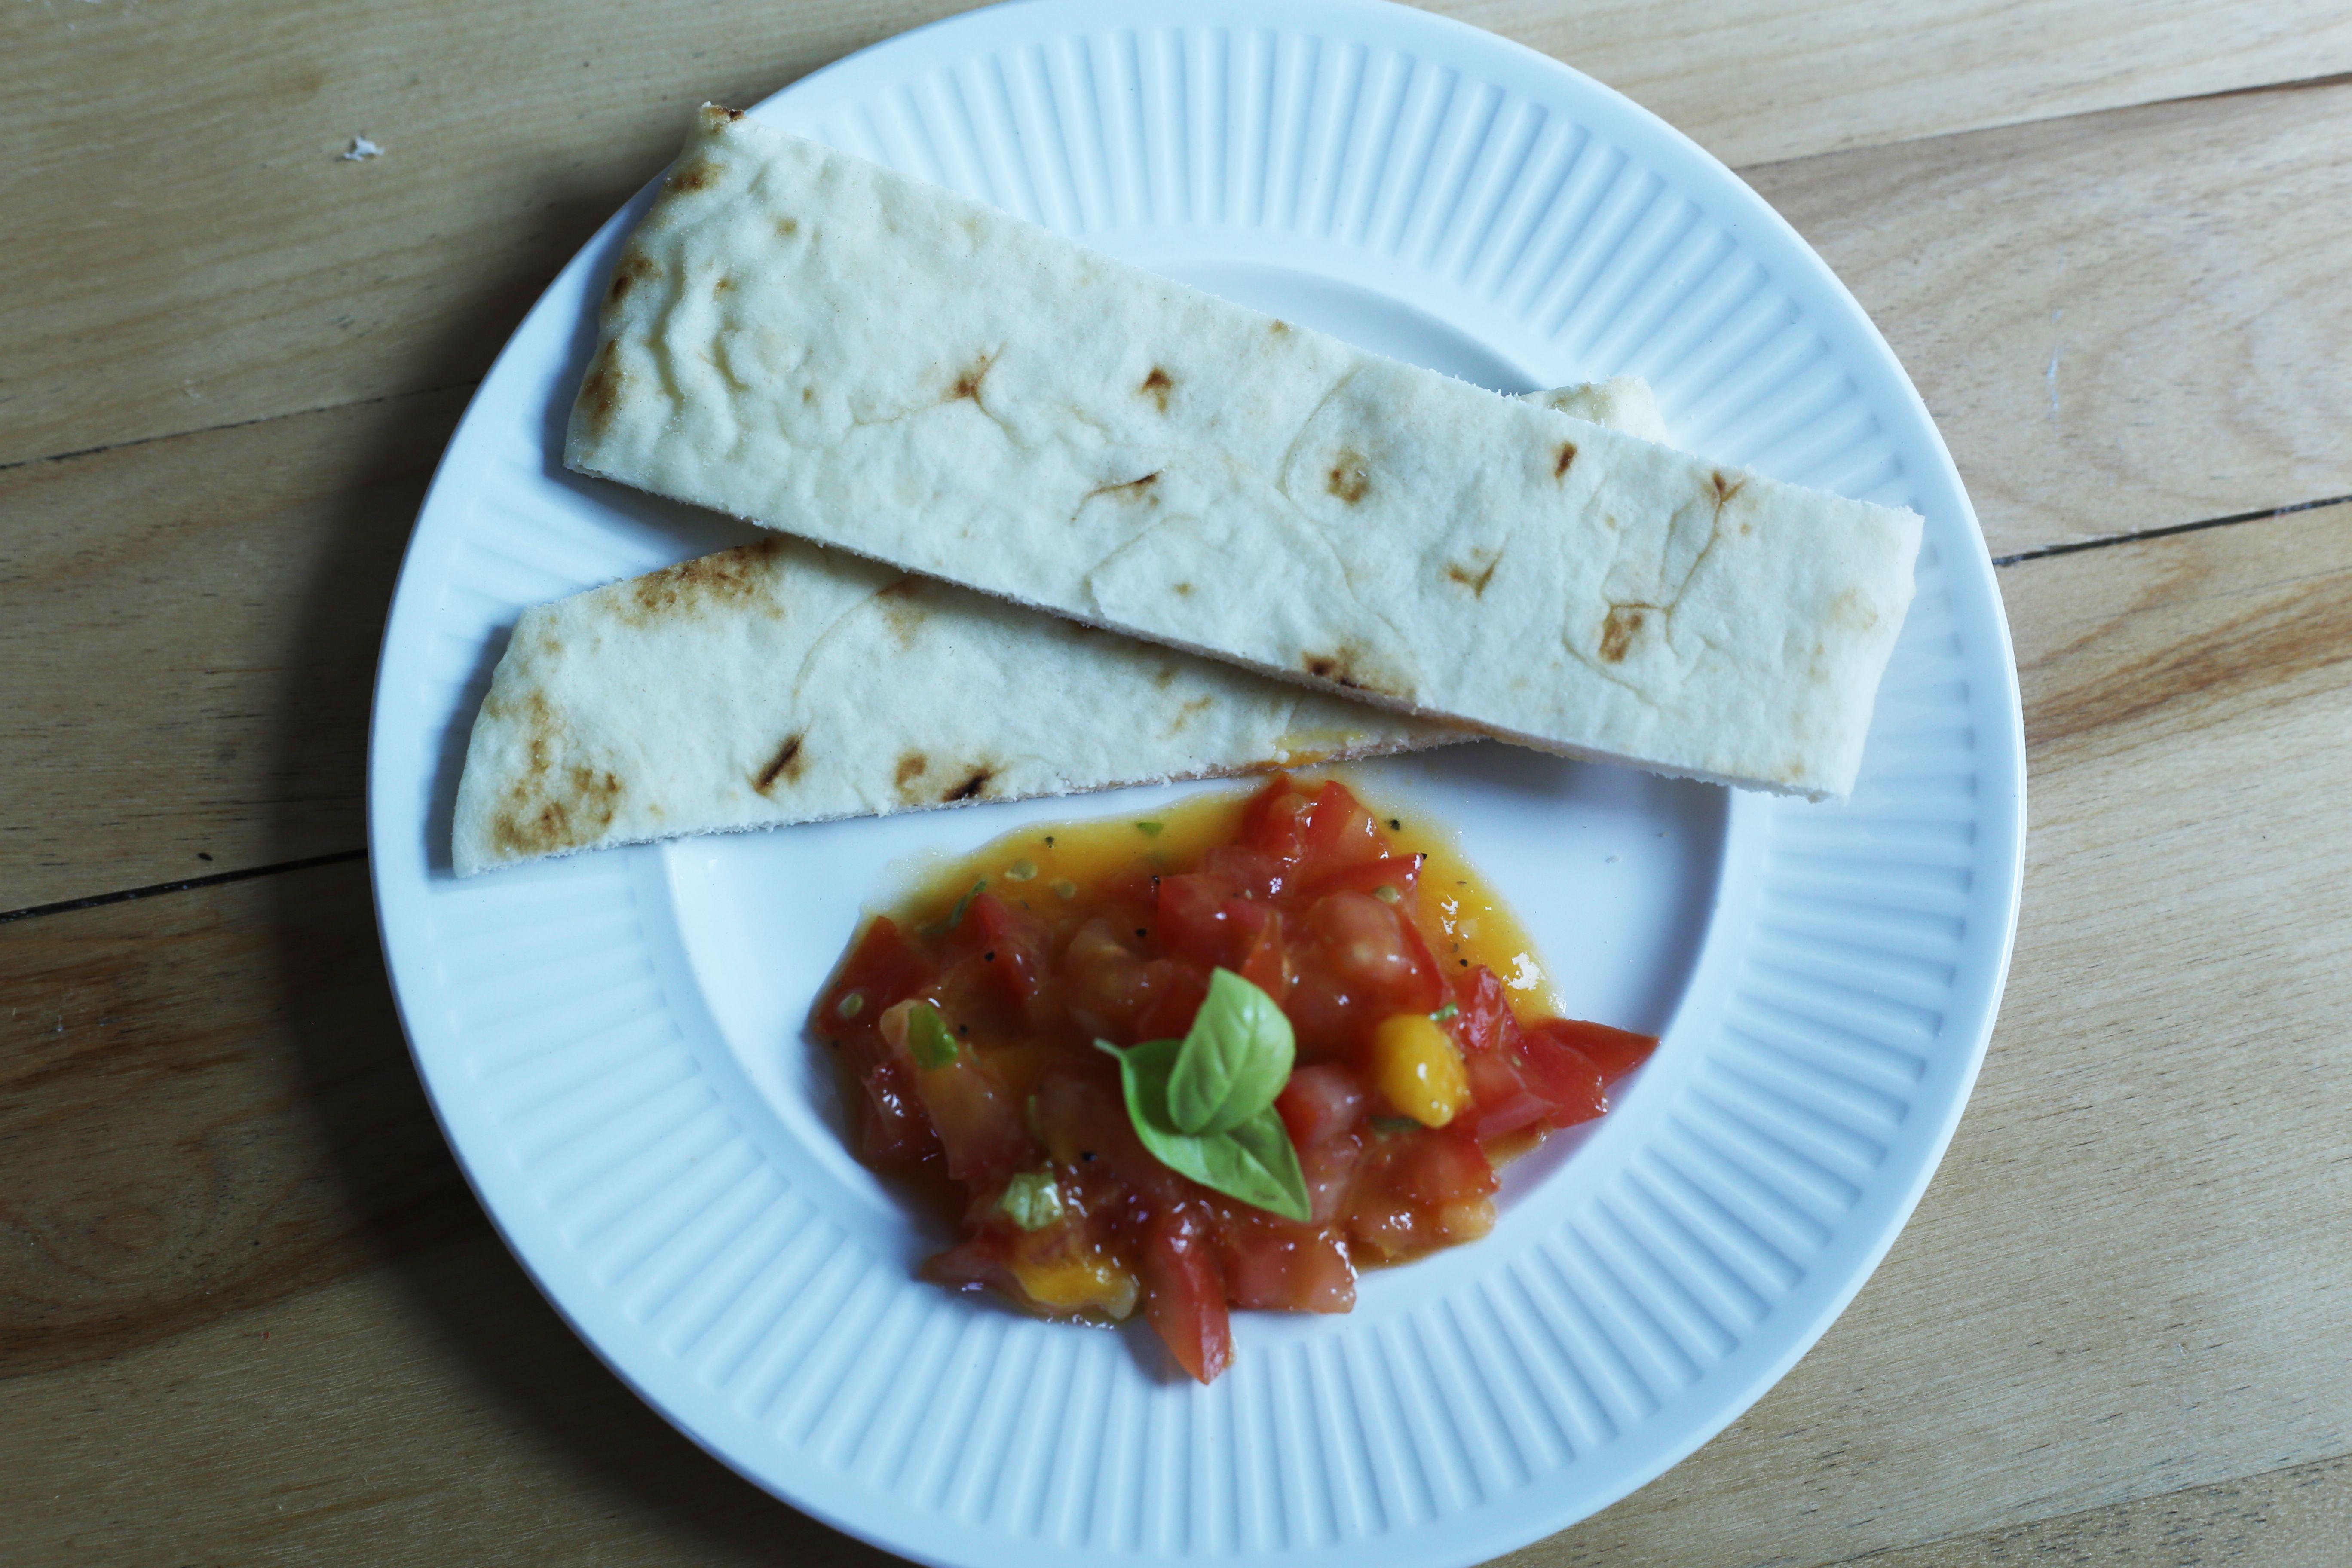 Mango Bruschetta 1 Mango 1 big tomato 1/4 cup of olive oil 1/2 t.s. ...